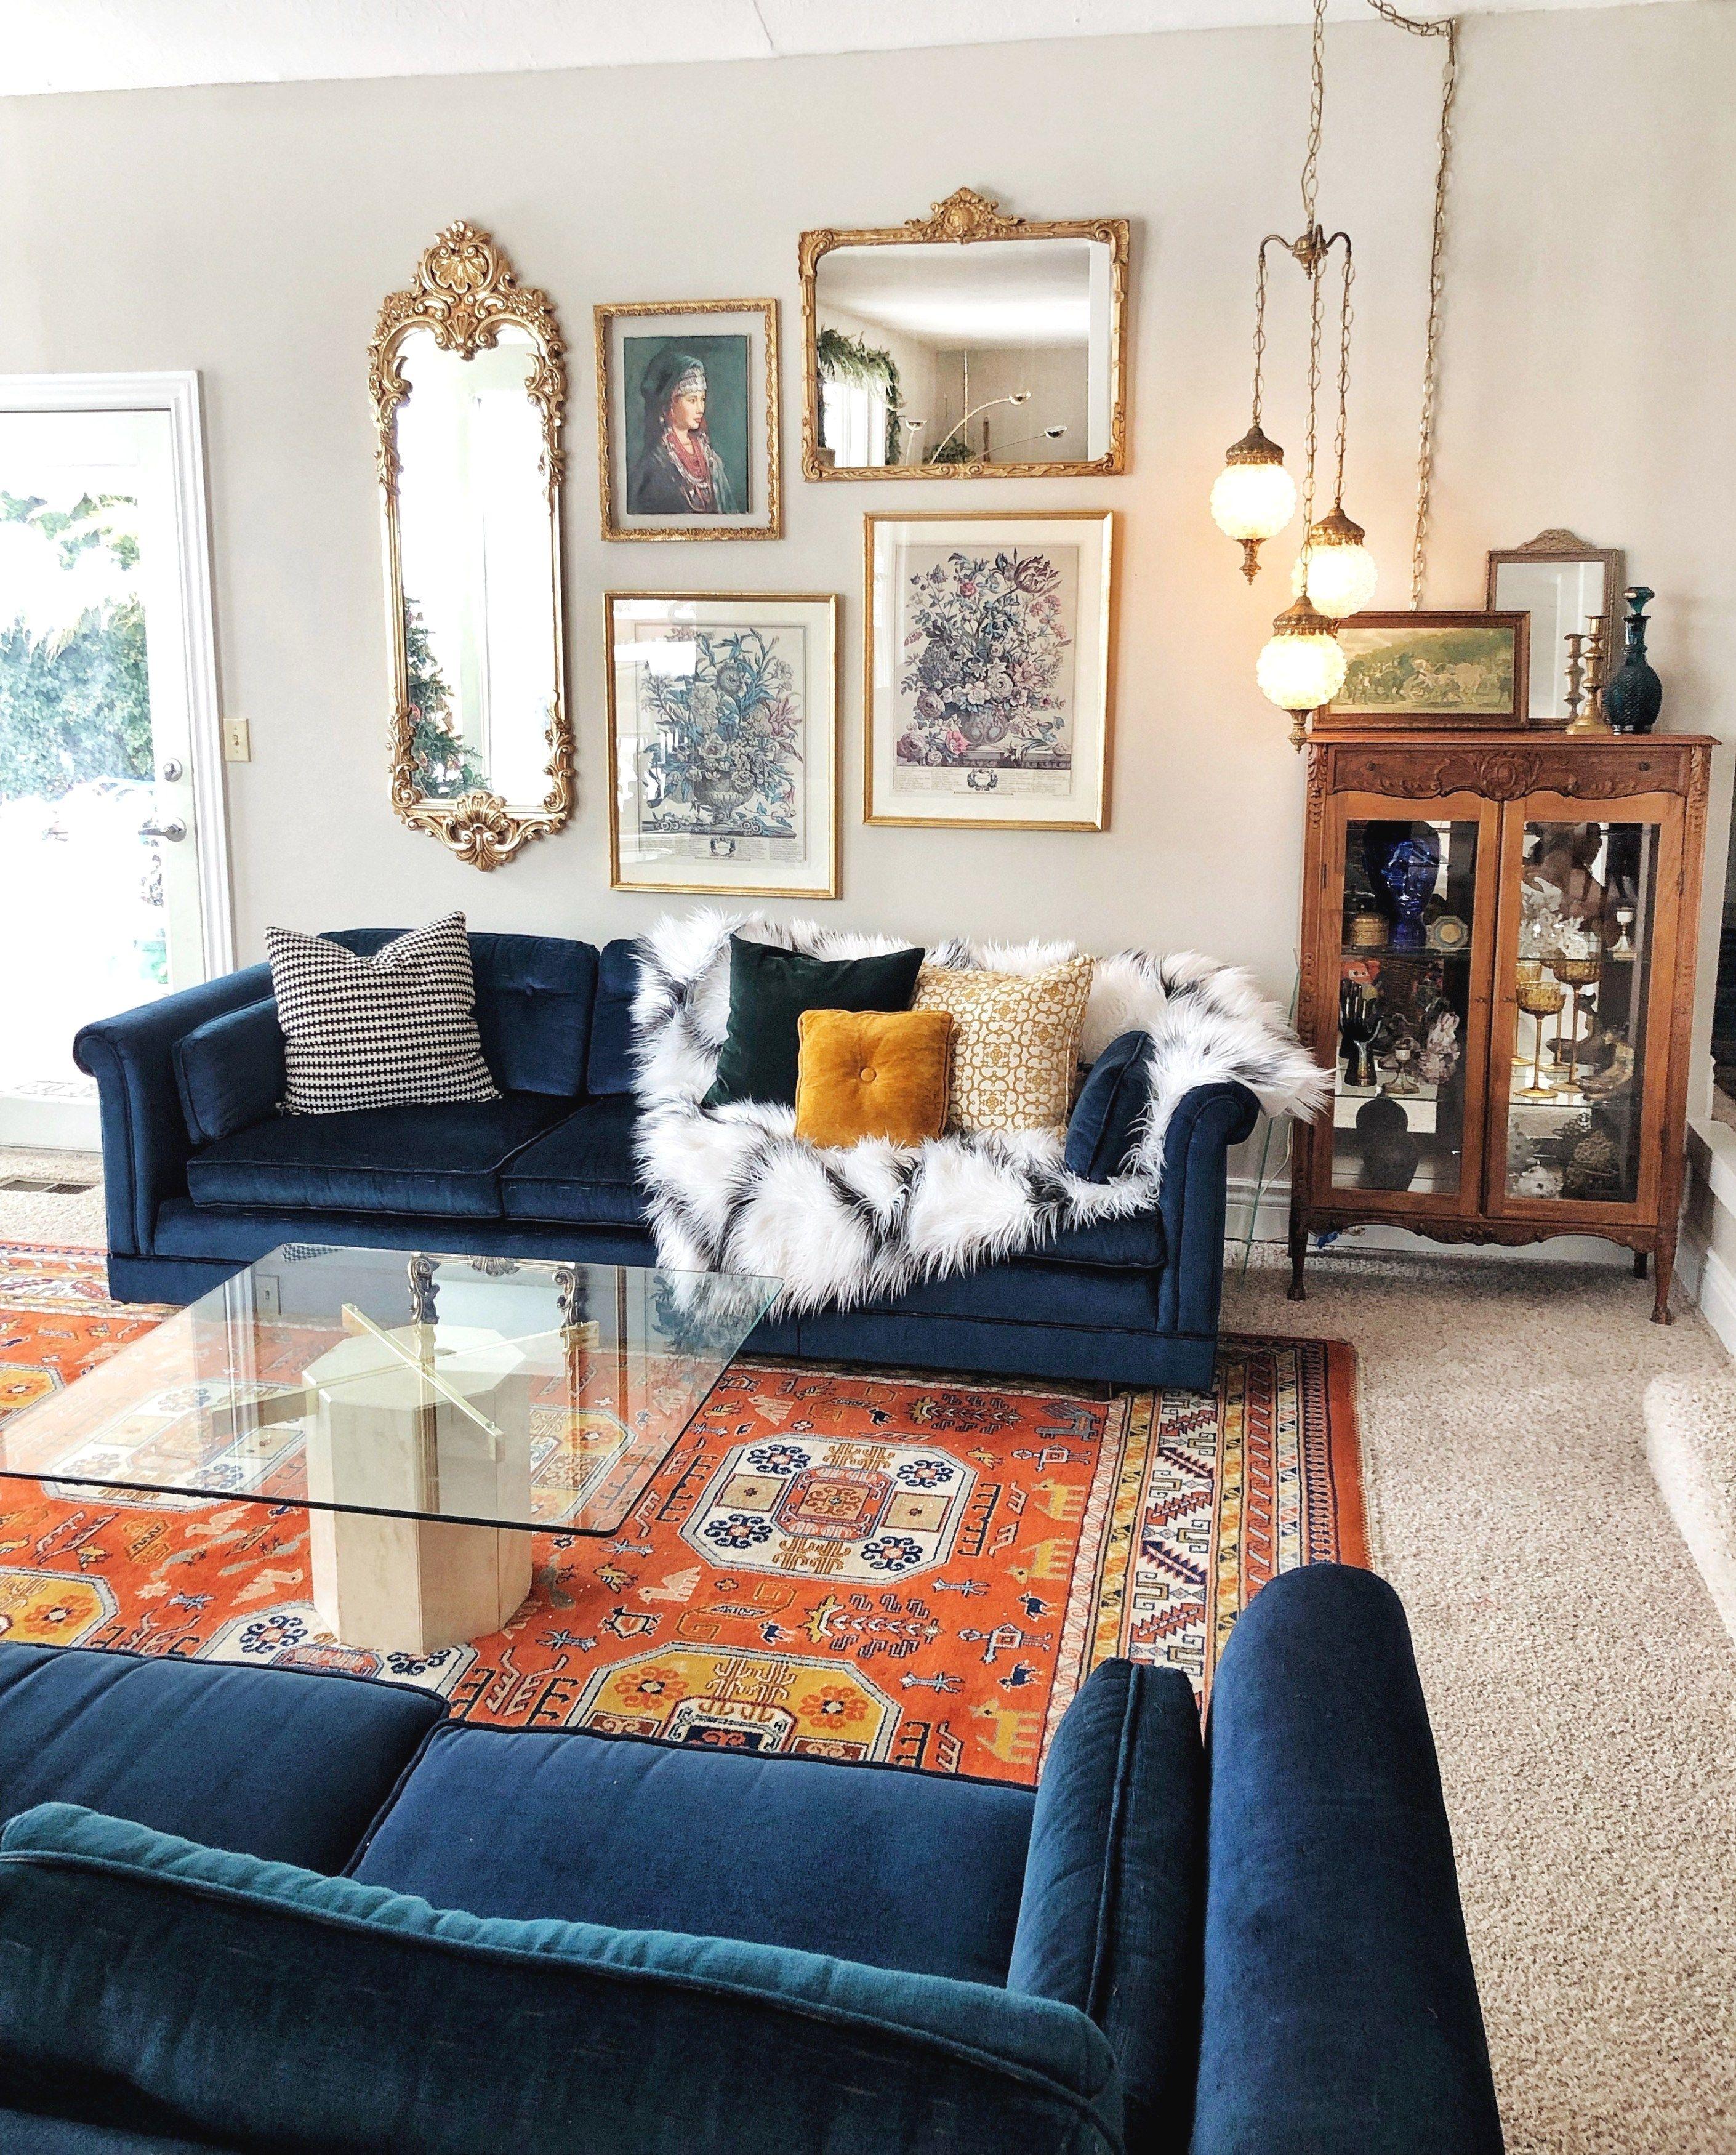 65 Awesome Minimalist Living Room Decor Ideas Colorful Eclectic Living Room Eclectic Living Room Eclectic Home Living room ideas eclectic